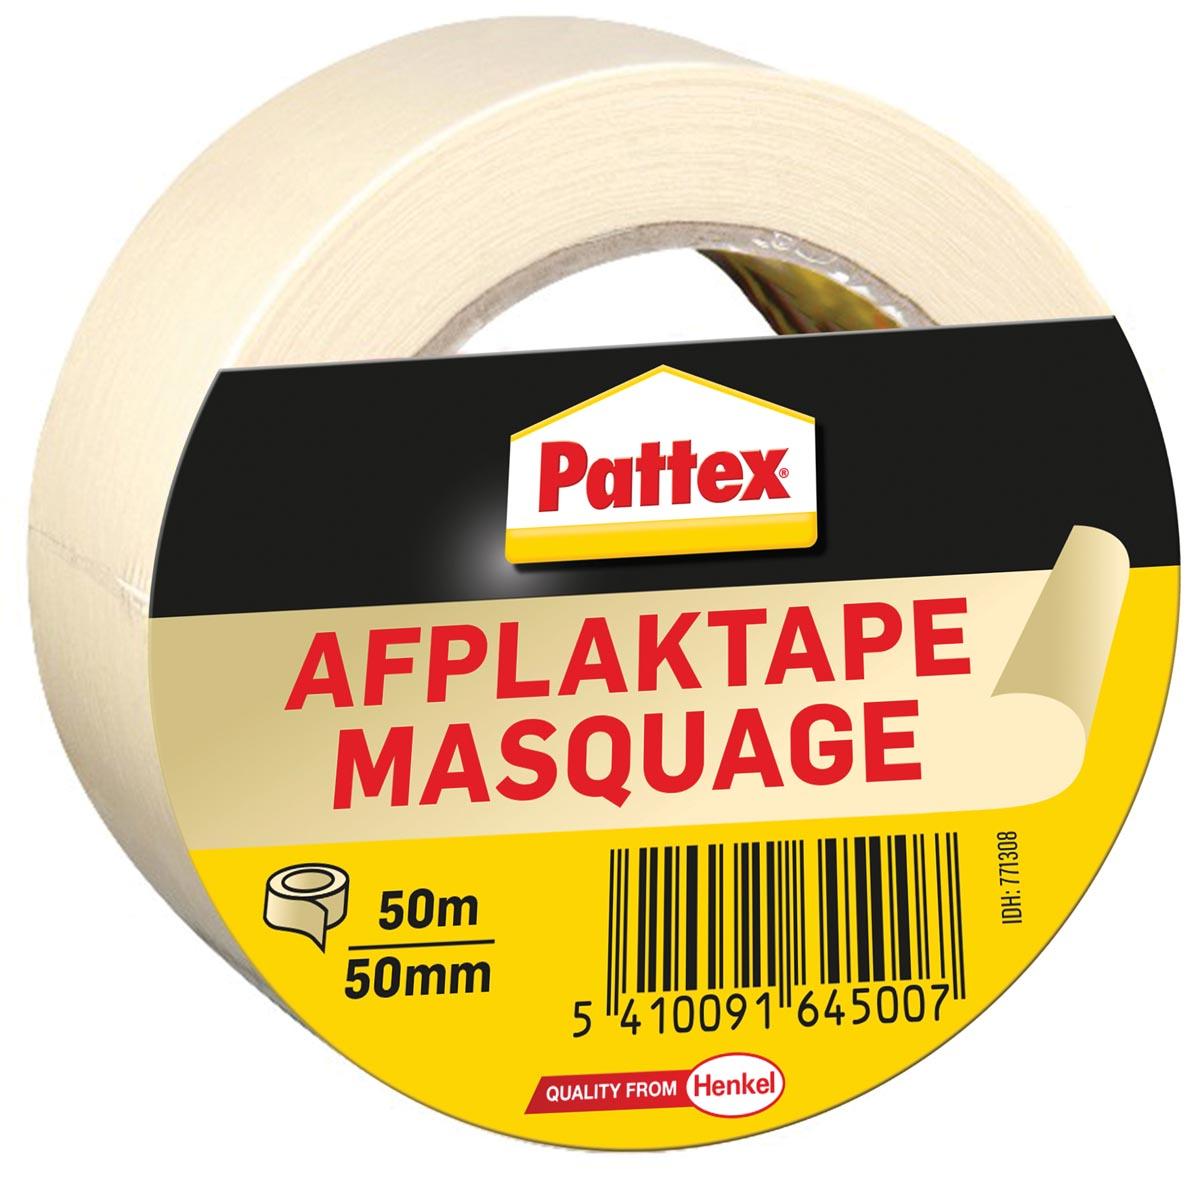 Pattex afplaktape, lengte 50 m, breedte 50 mm